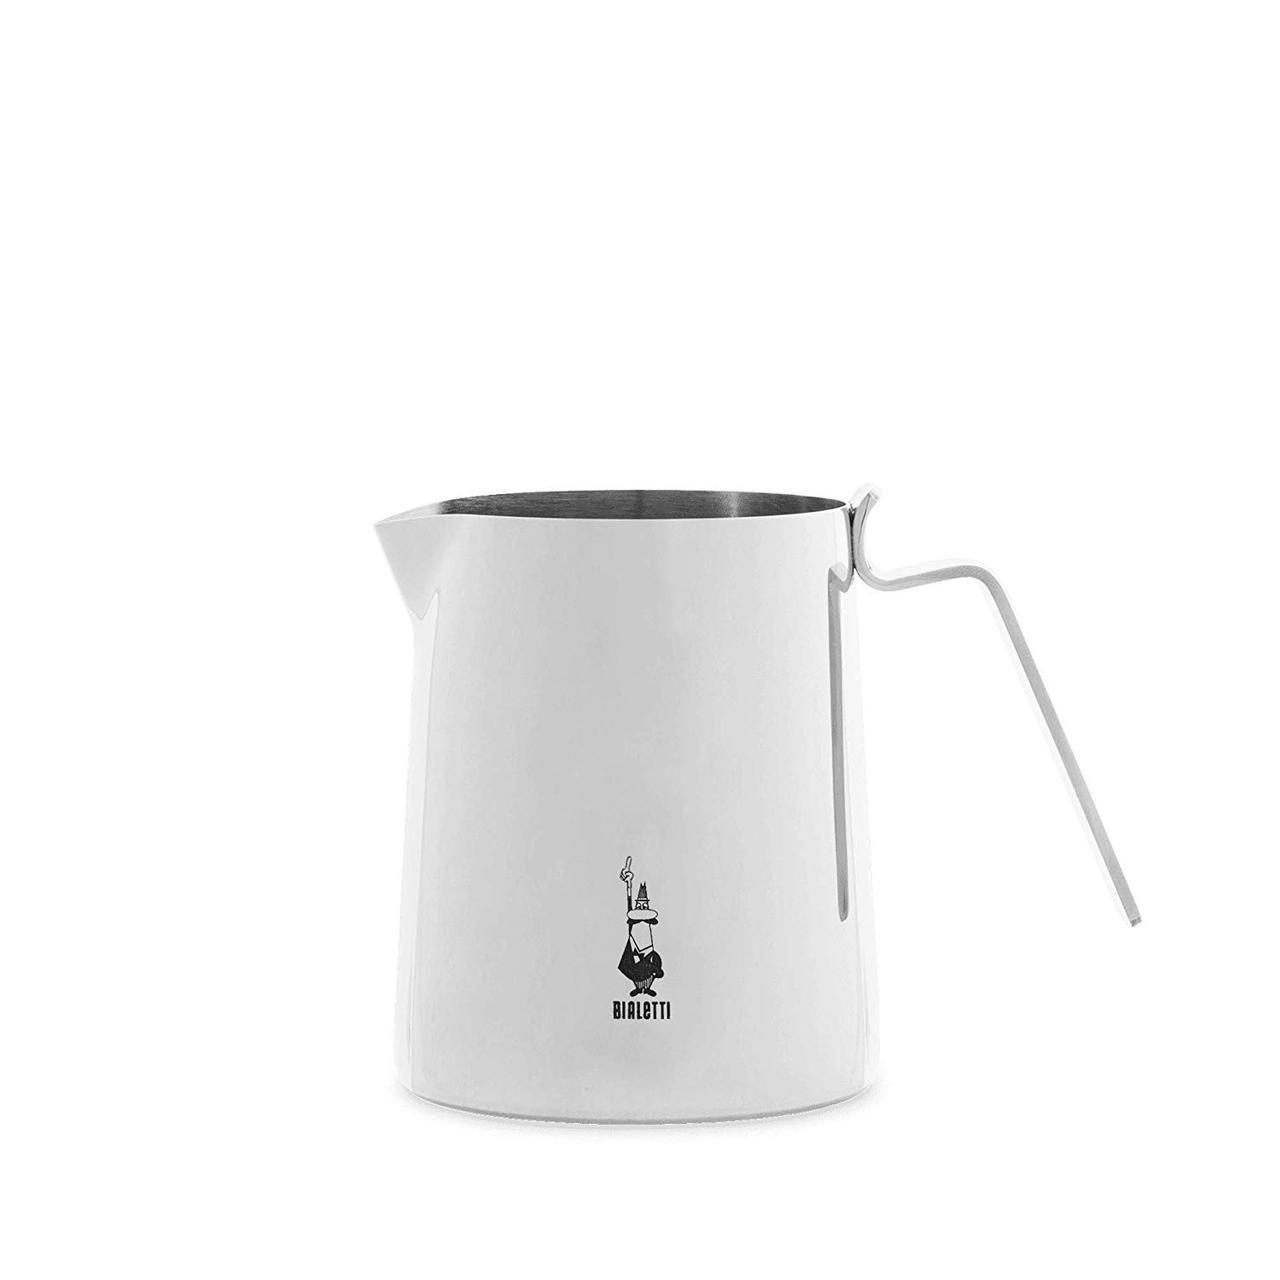 Молочник-питчер Bialetti Elegance из нержавеющей стали, Белый, 500 мл